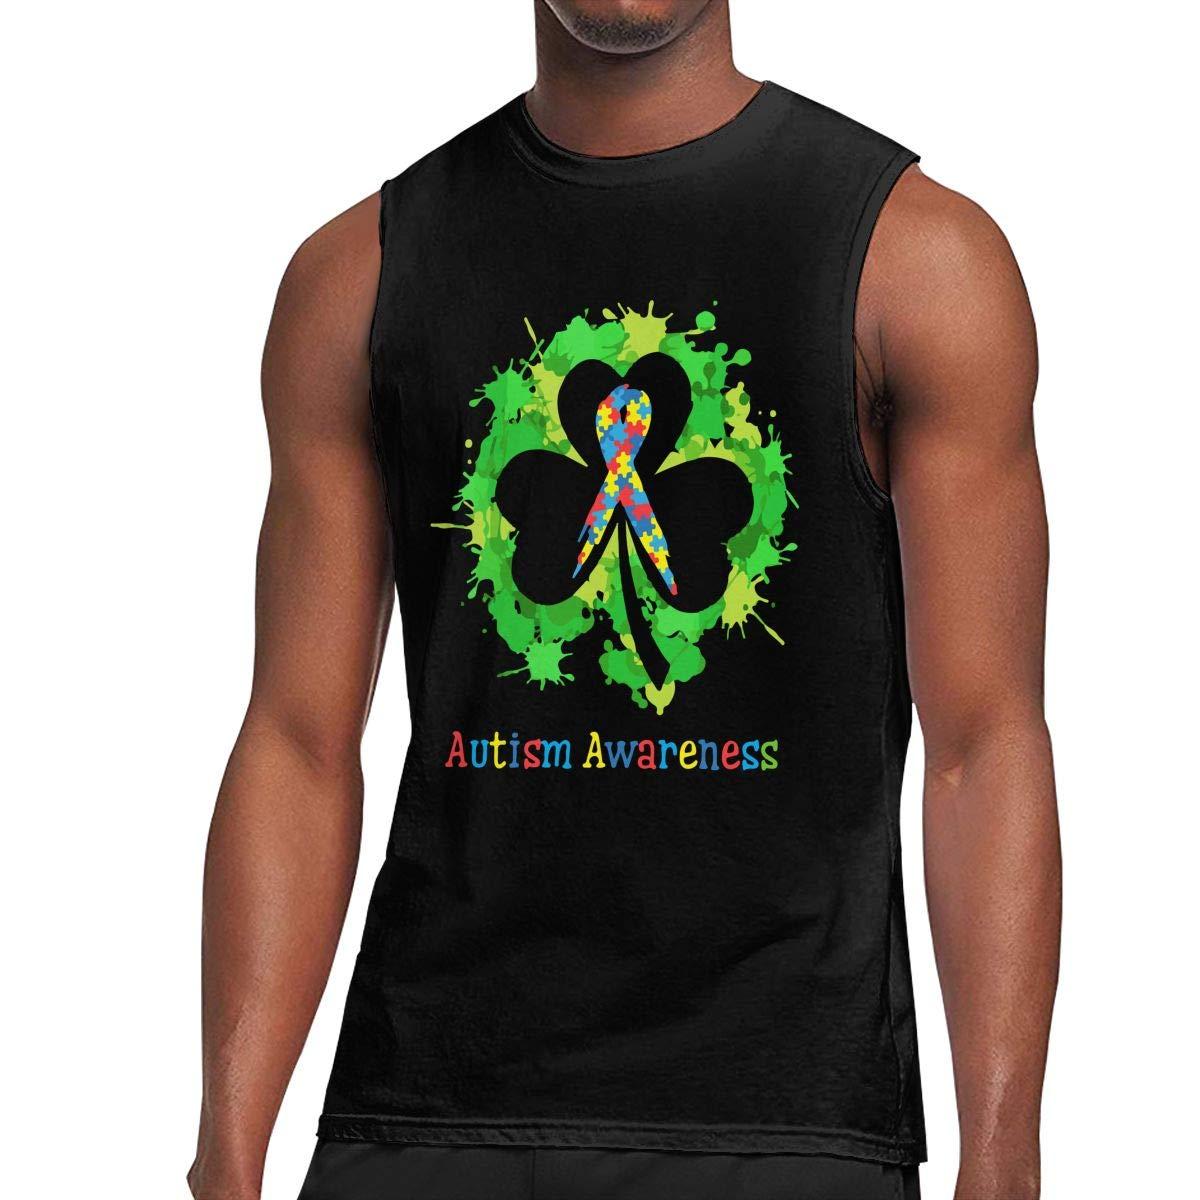 BFBG5f-Tee Mens Autism Awareness Muscle Workout Jersey Tank Tees